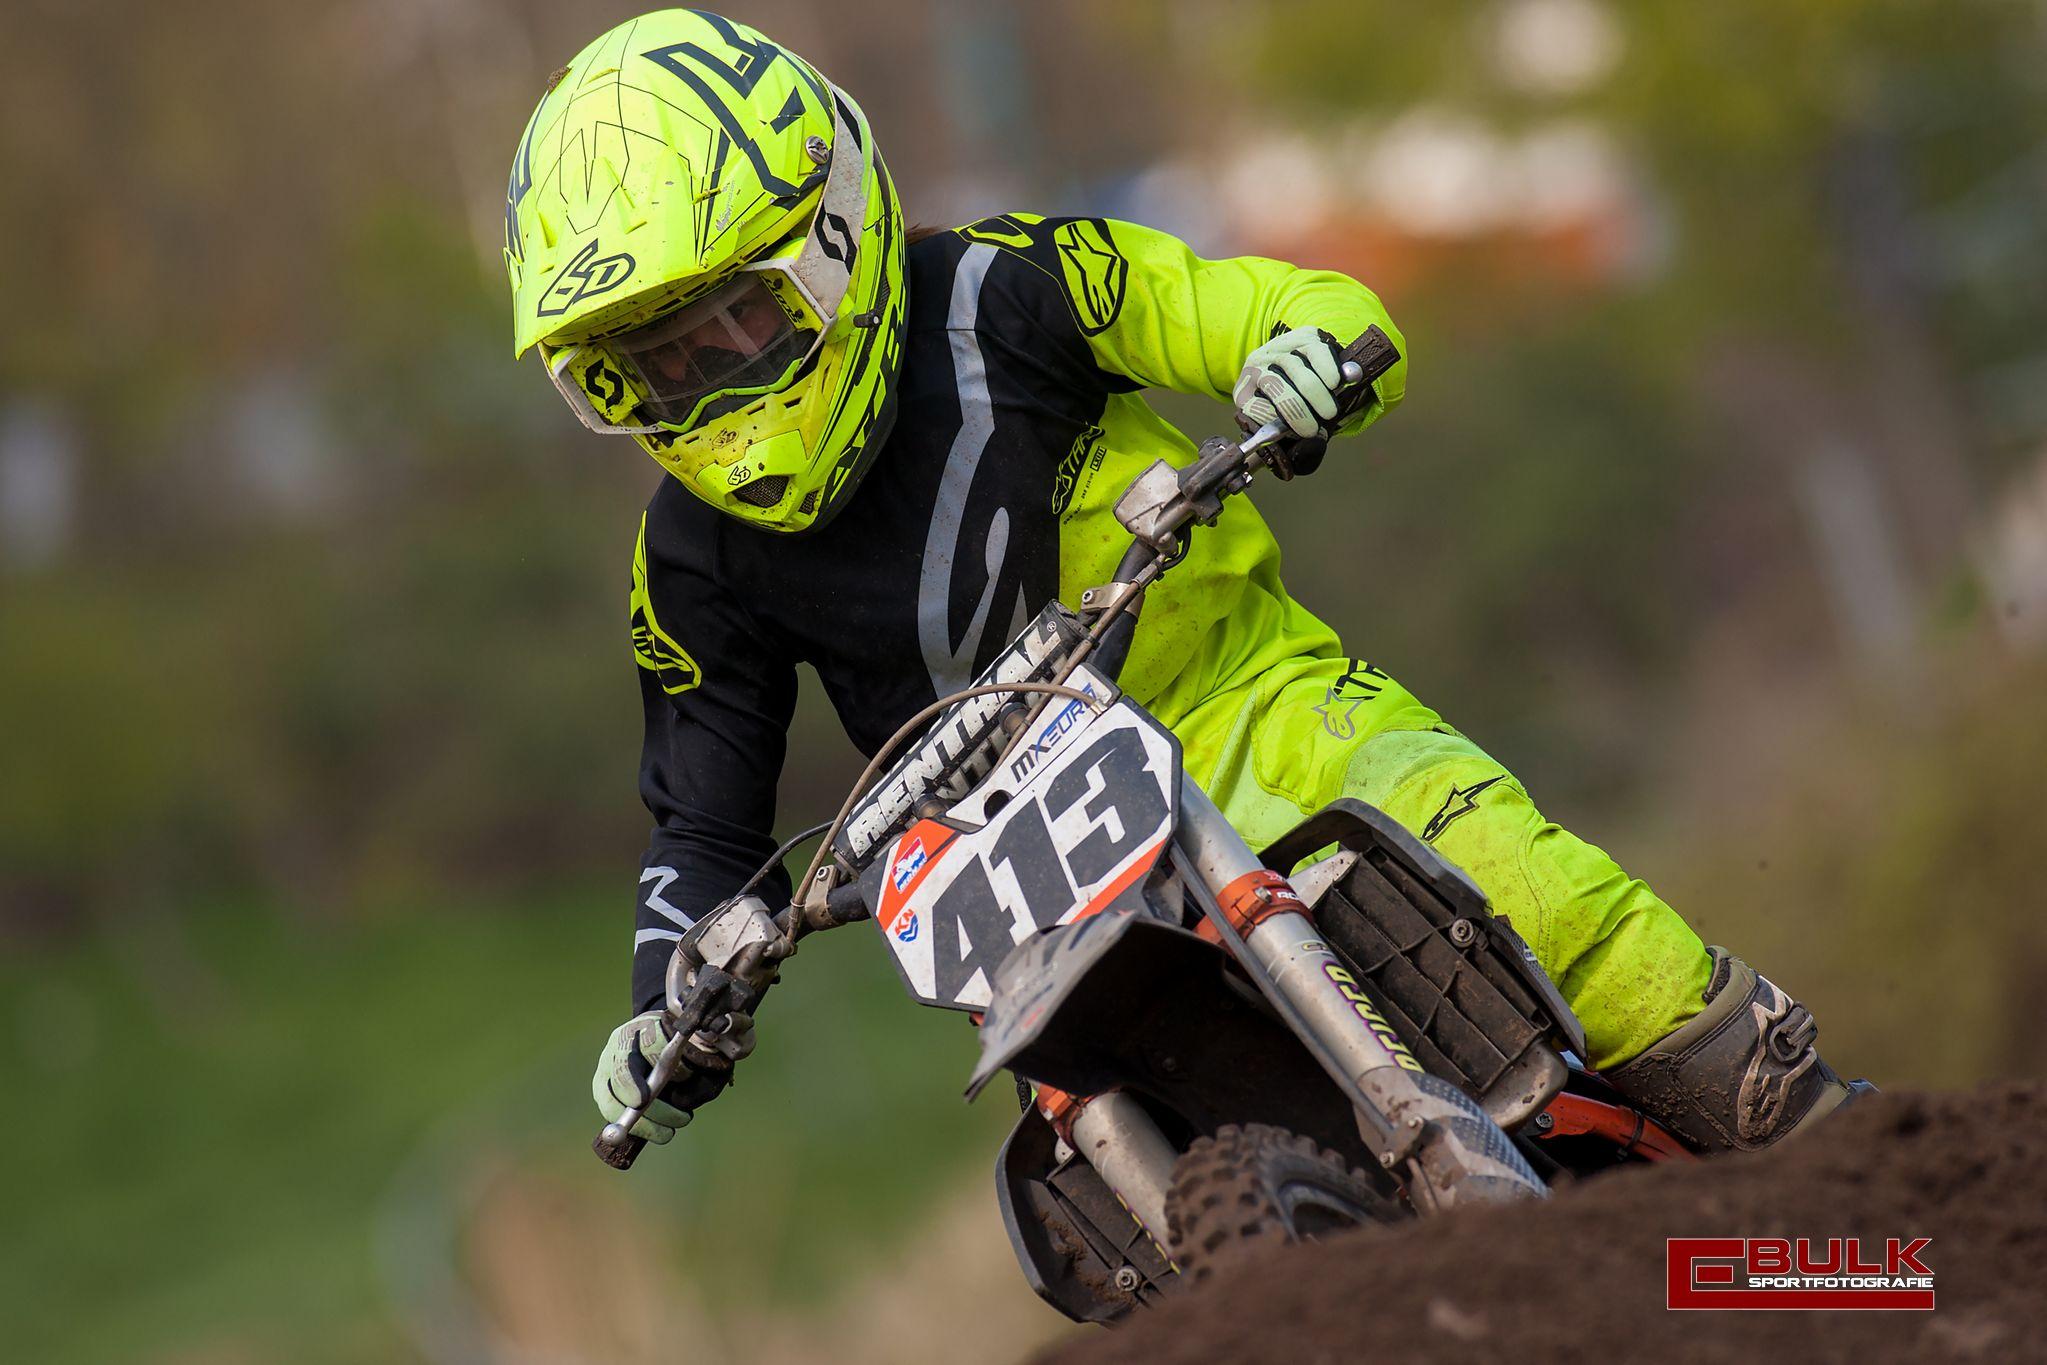 ebs_0193-ed_bulk_sportfotografie